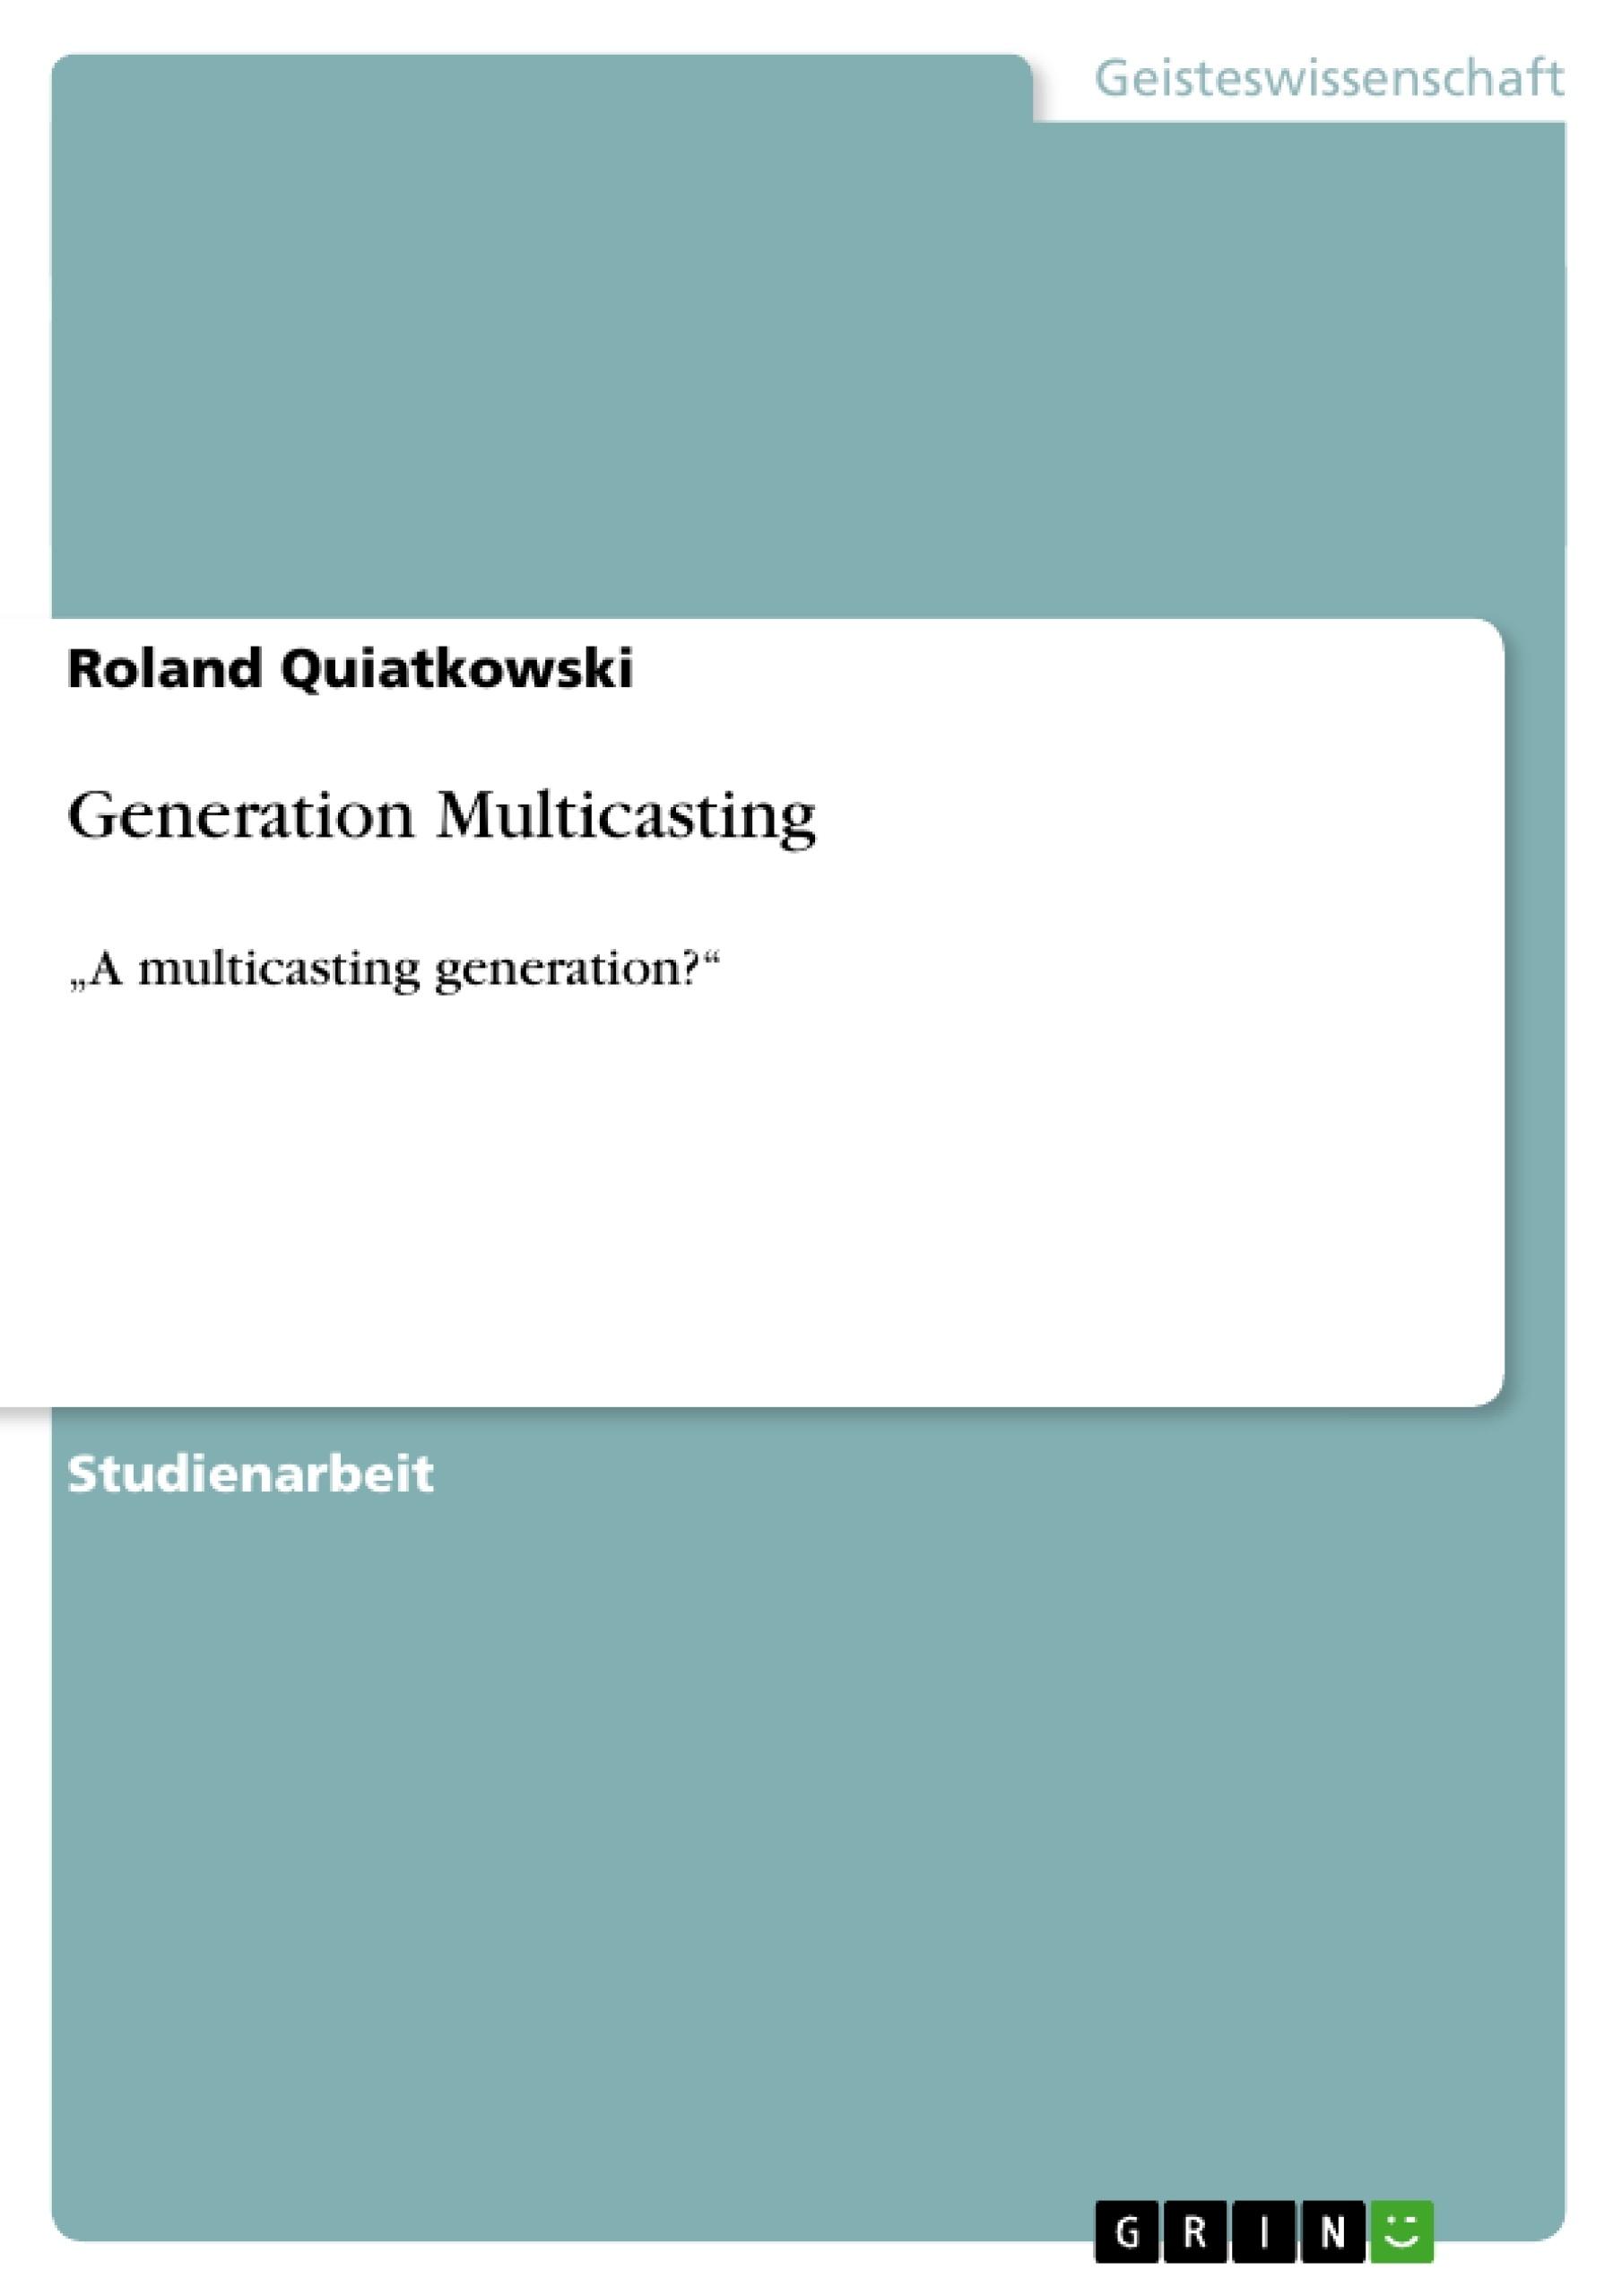 Titel: Generation Multicasting